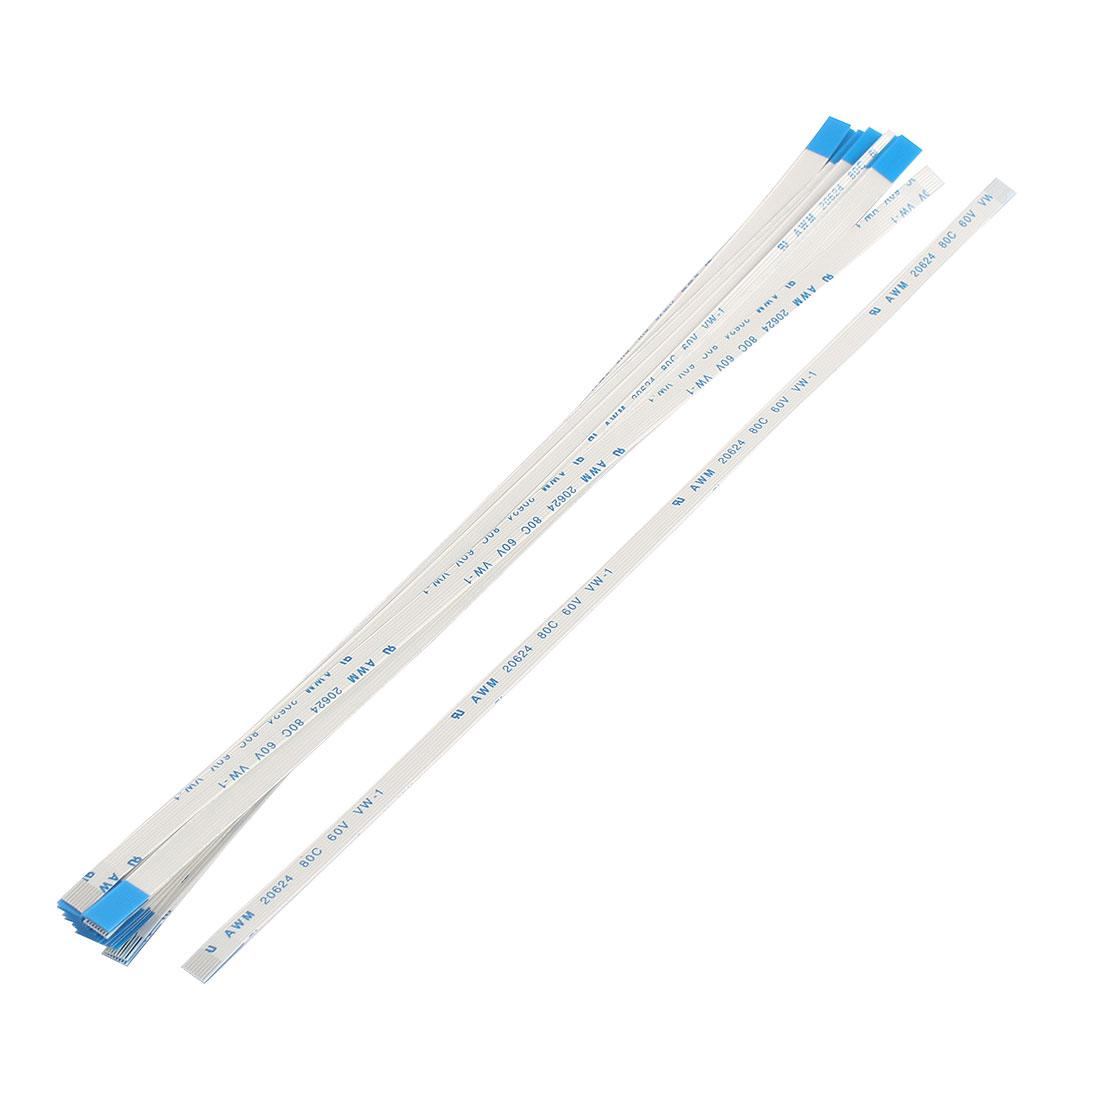 20Pcs 0.5mm Pitch 8 Pin AWM 80C 60V VW-1 Flexible Flat Cable FFC FPC 200mm